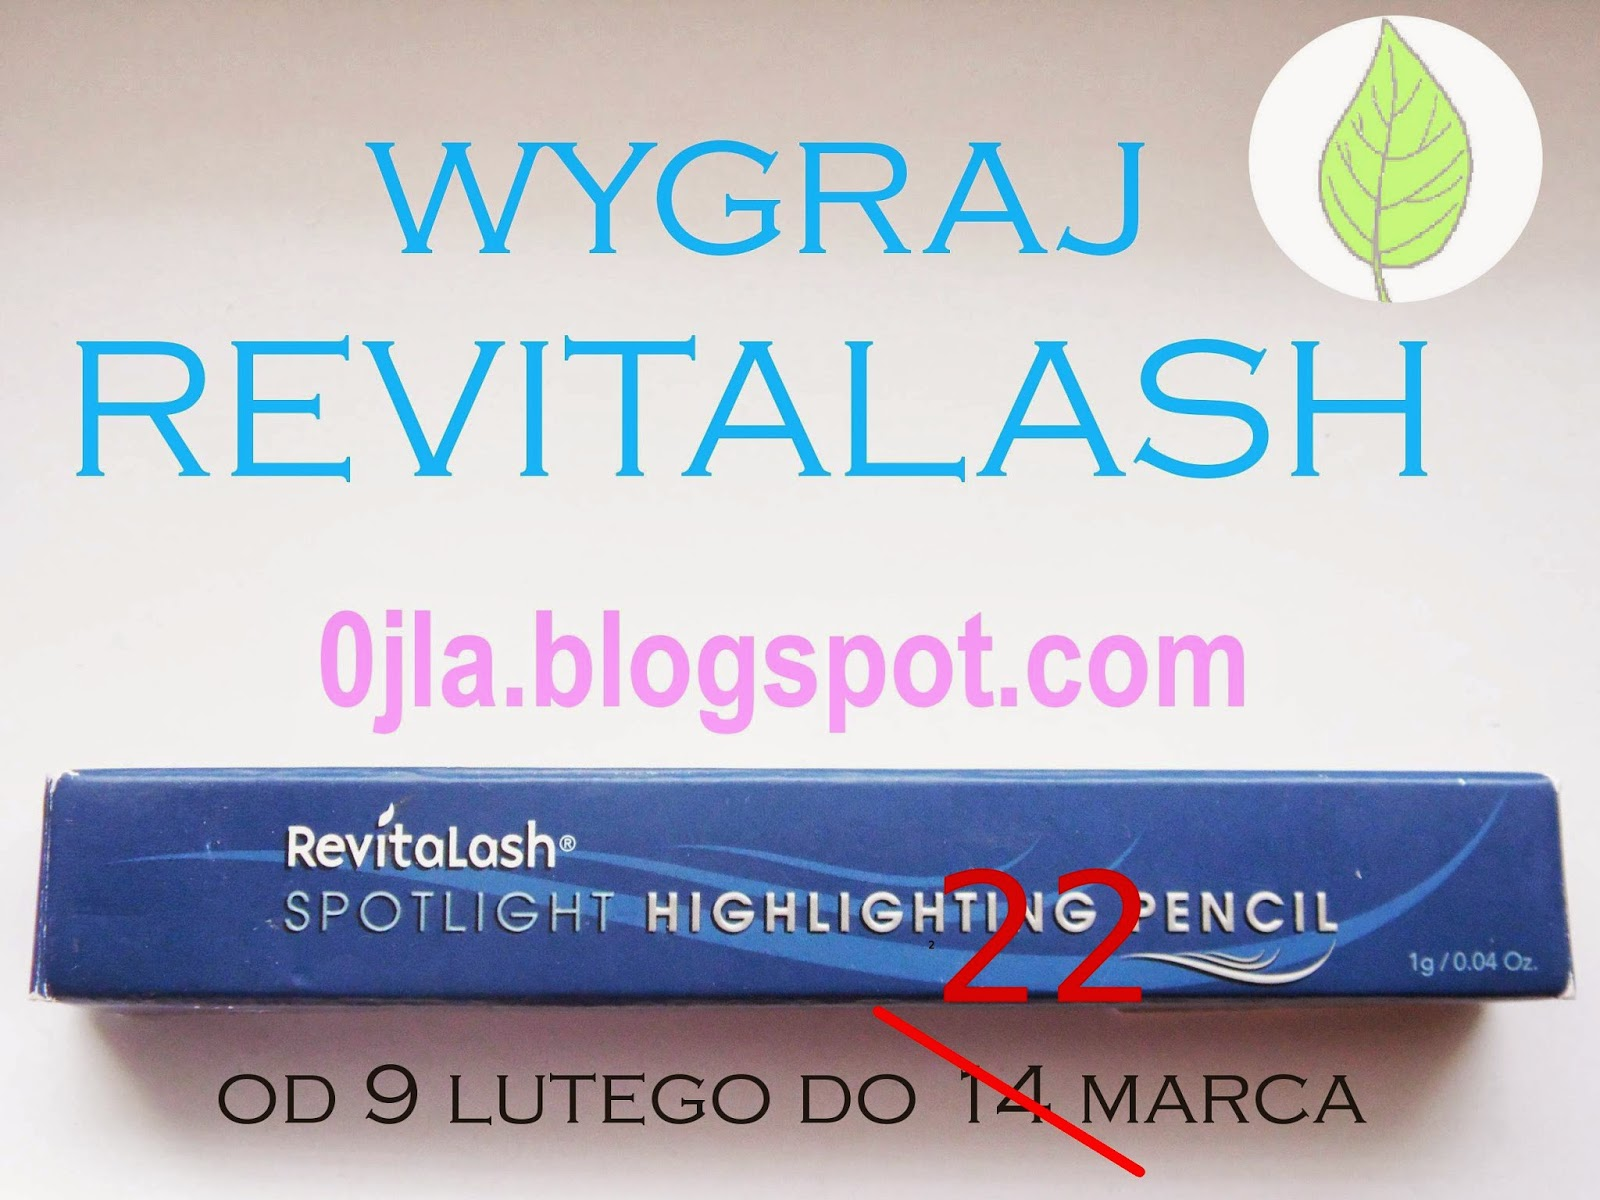 http://0jla.blogspot.com/2014/02/wygraj-revitalash.html